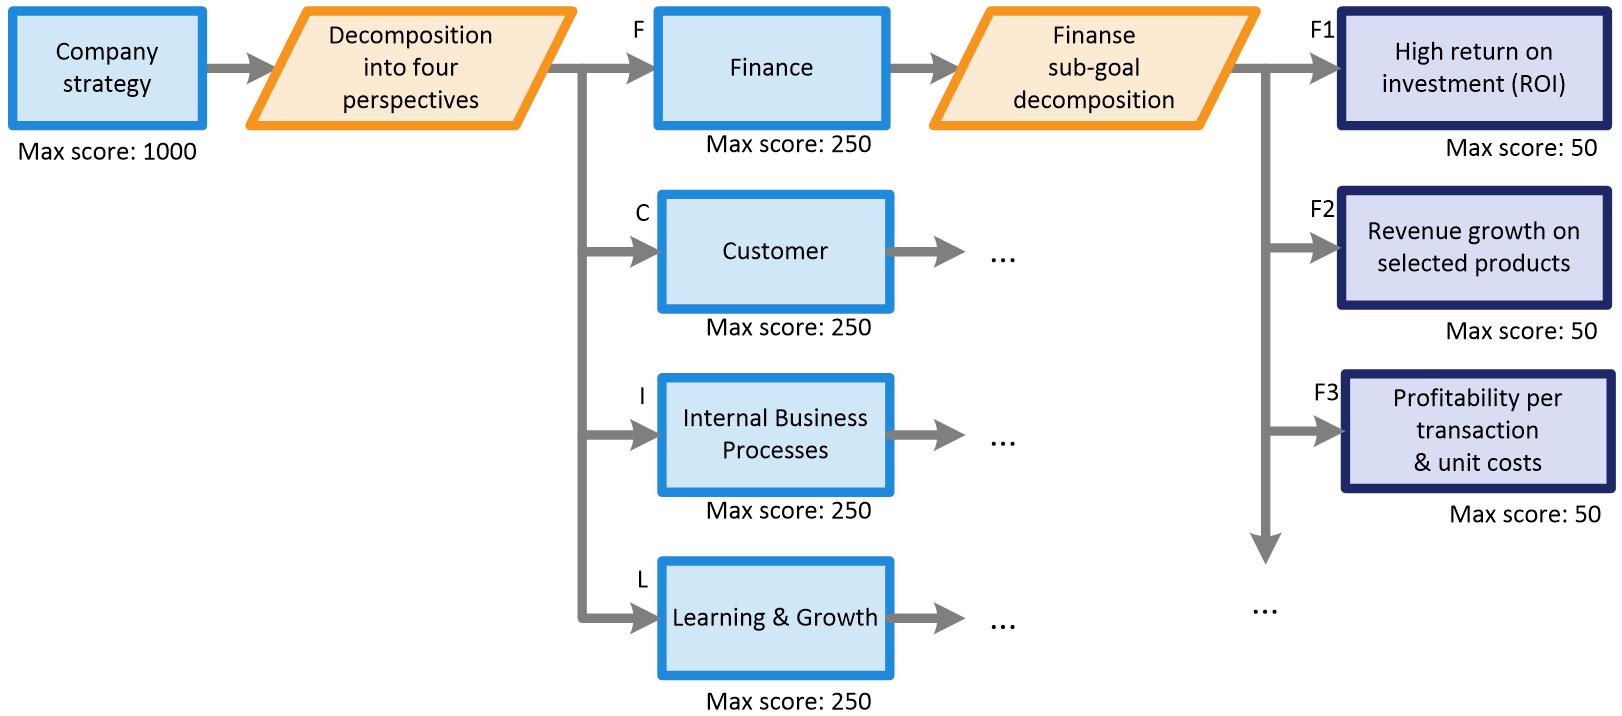 scoring conformance assessment